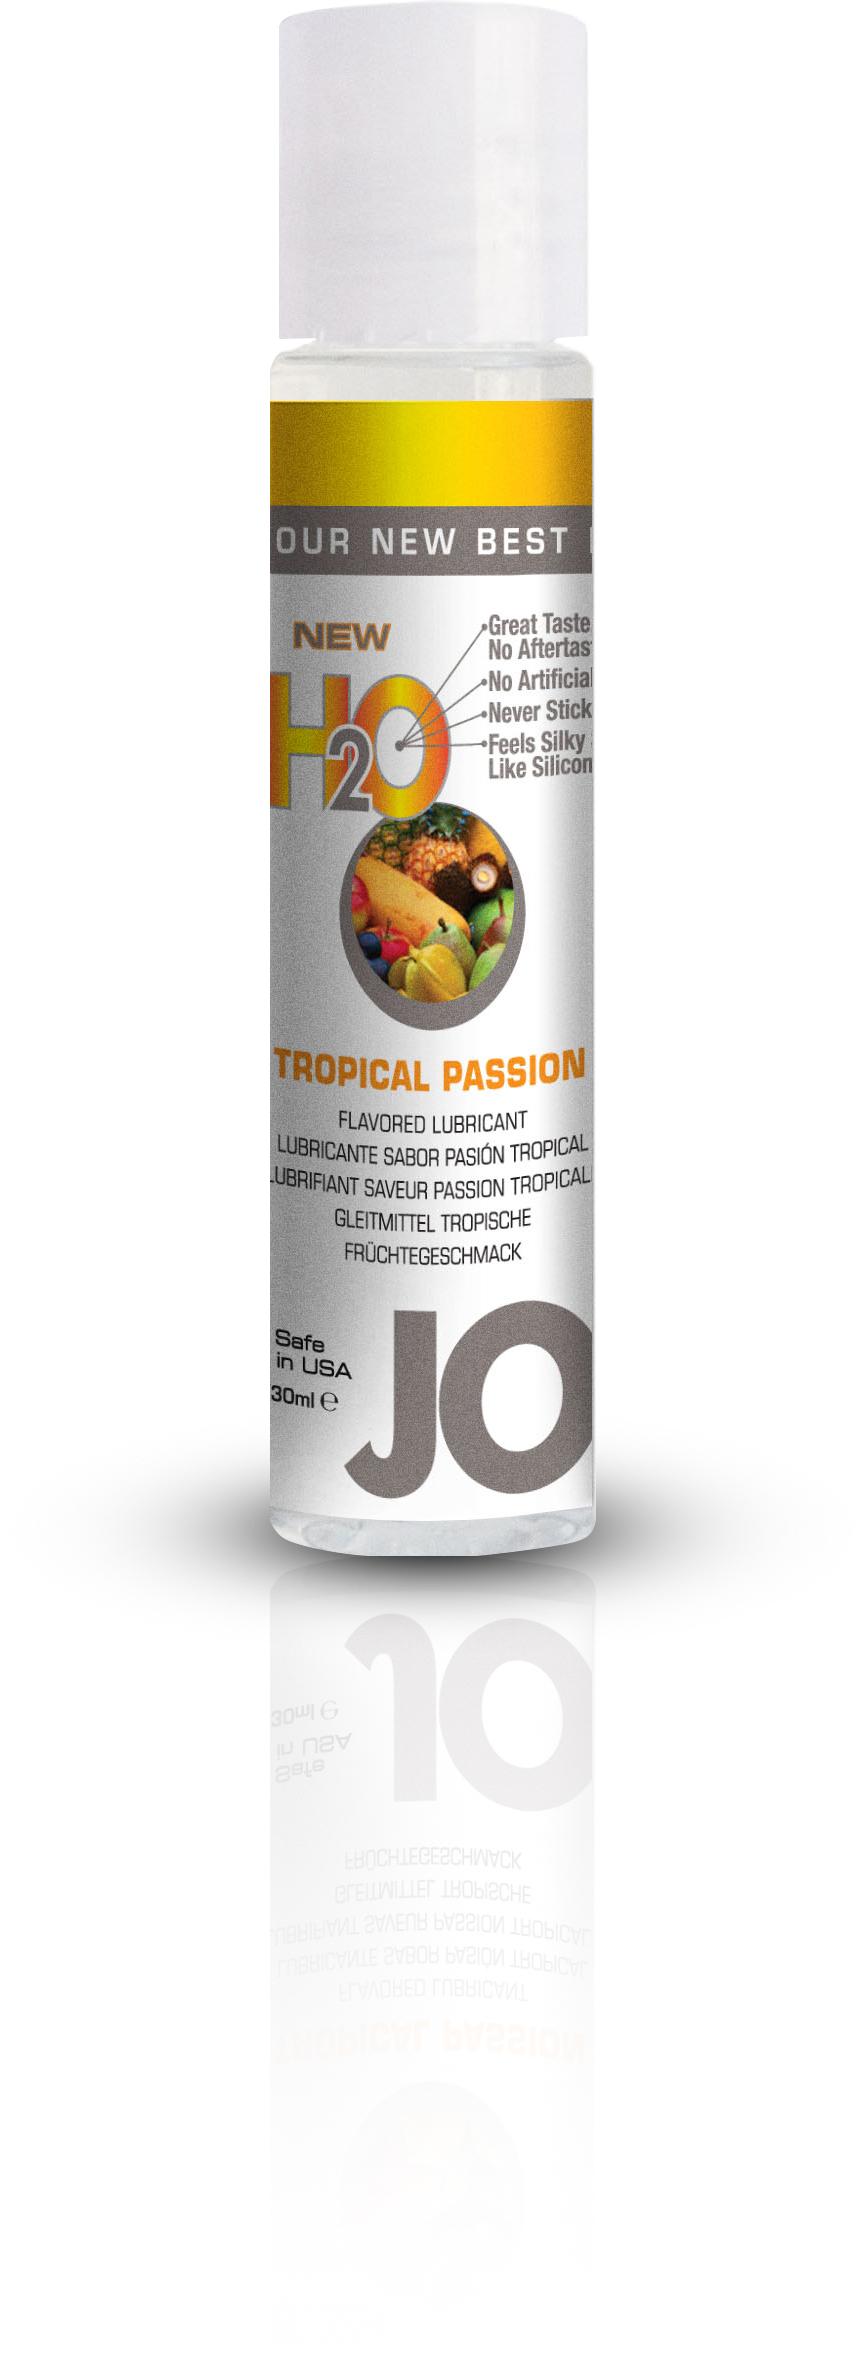 30121_JO_h2o_flavored_lubricant_1oz_1oz_tropical.jpg